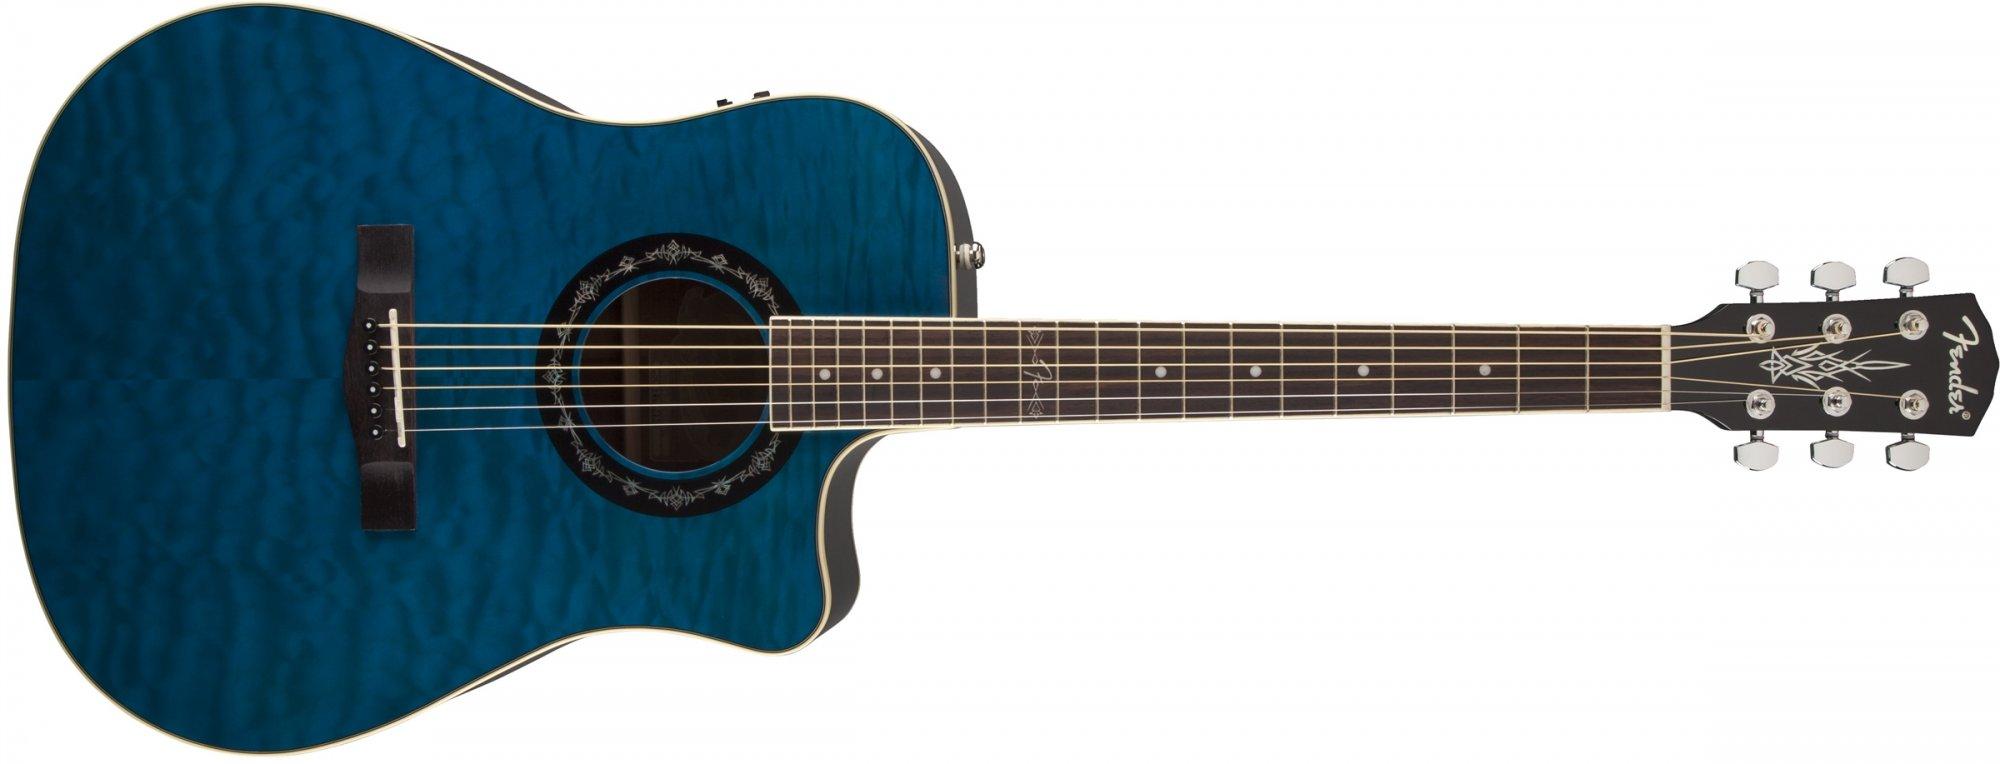 fender t bucket 300ce acoustic electric guitar transparent blue 885978276936. Black Bedroom Furniture Sets. Home Design Ideas